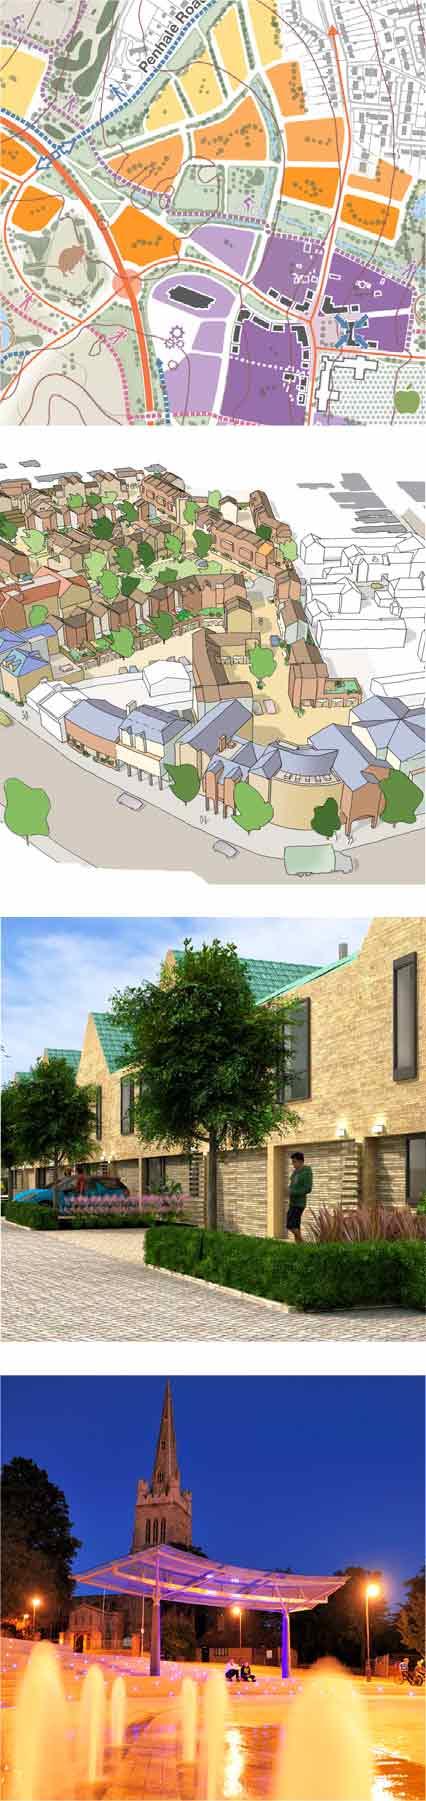 Senior Associate Urban Designer Savills Birmingham Oxford Cambridge Urban Design